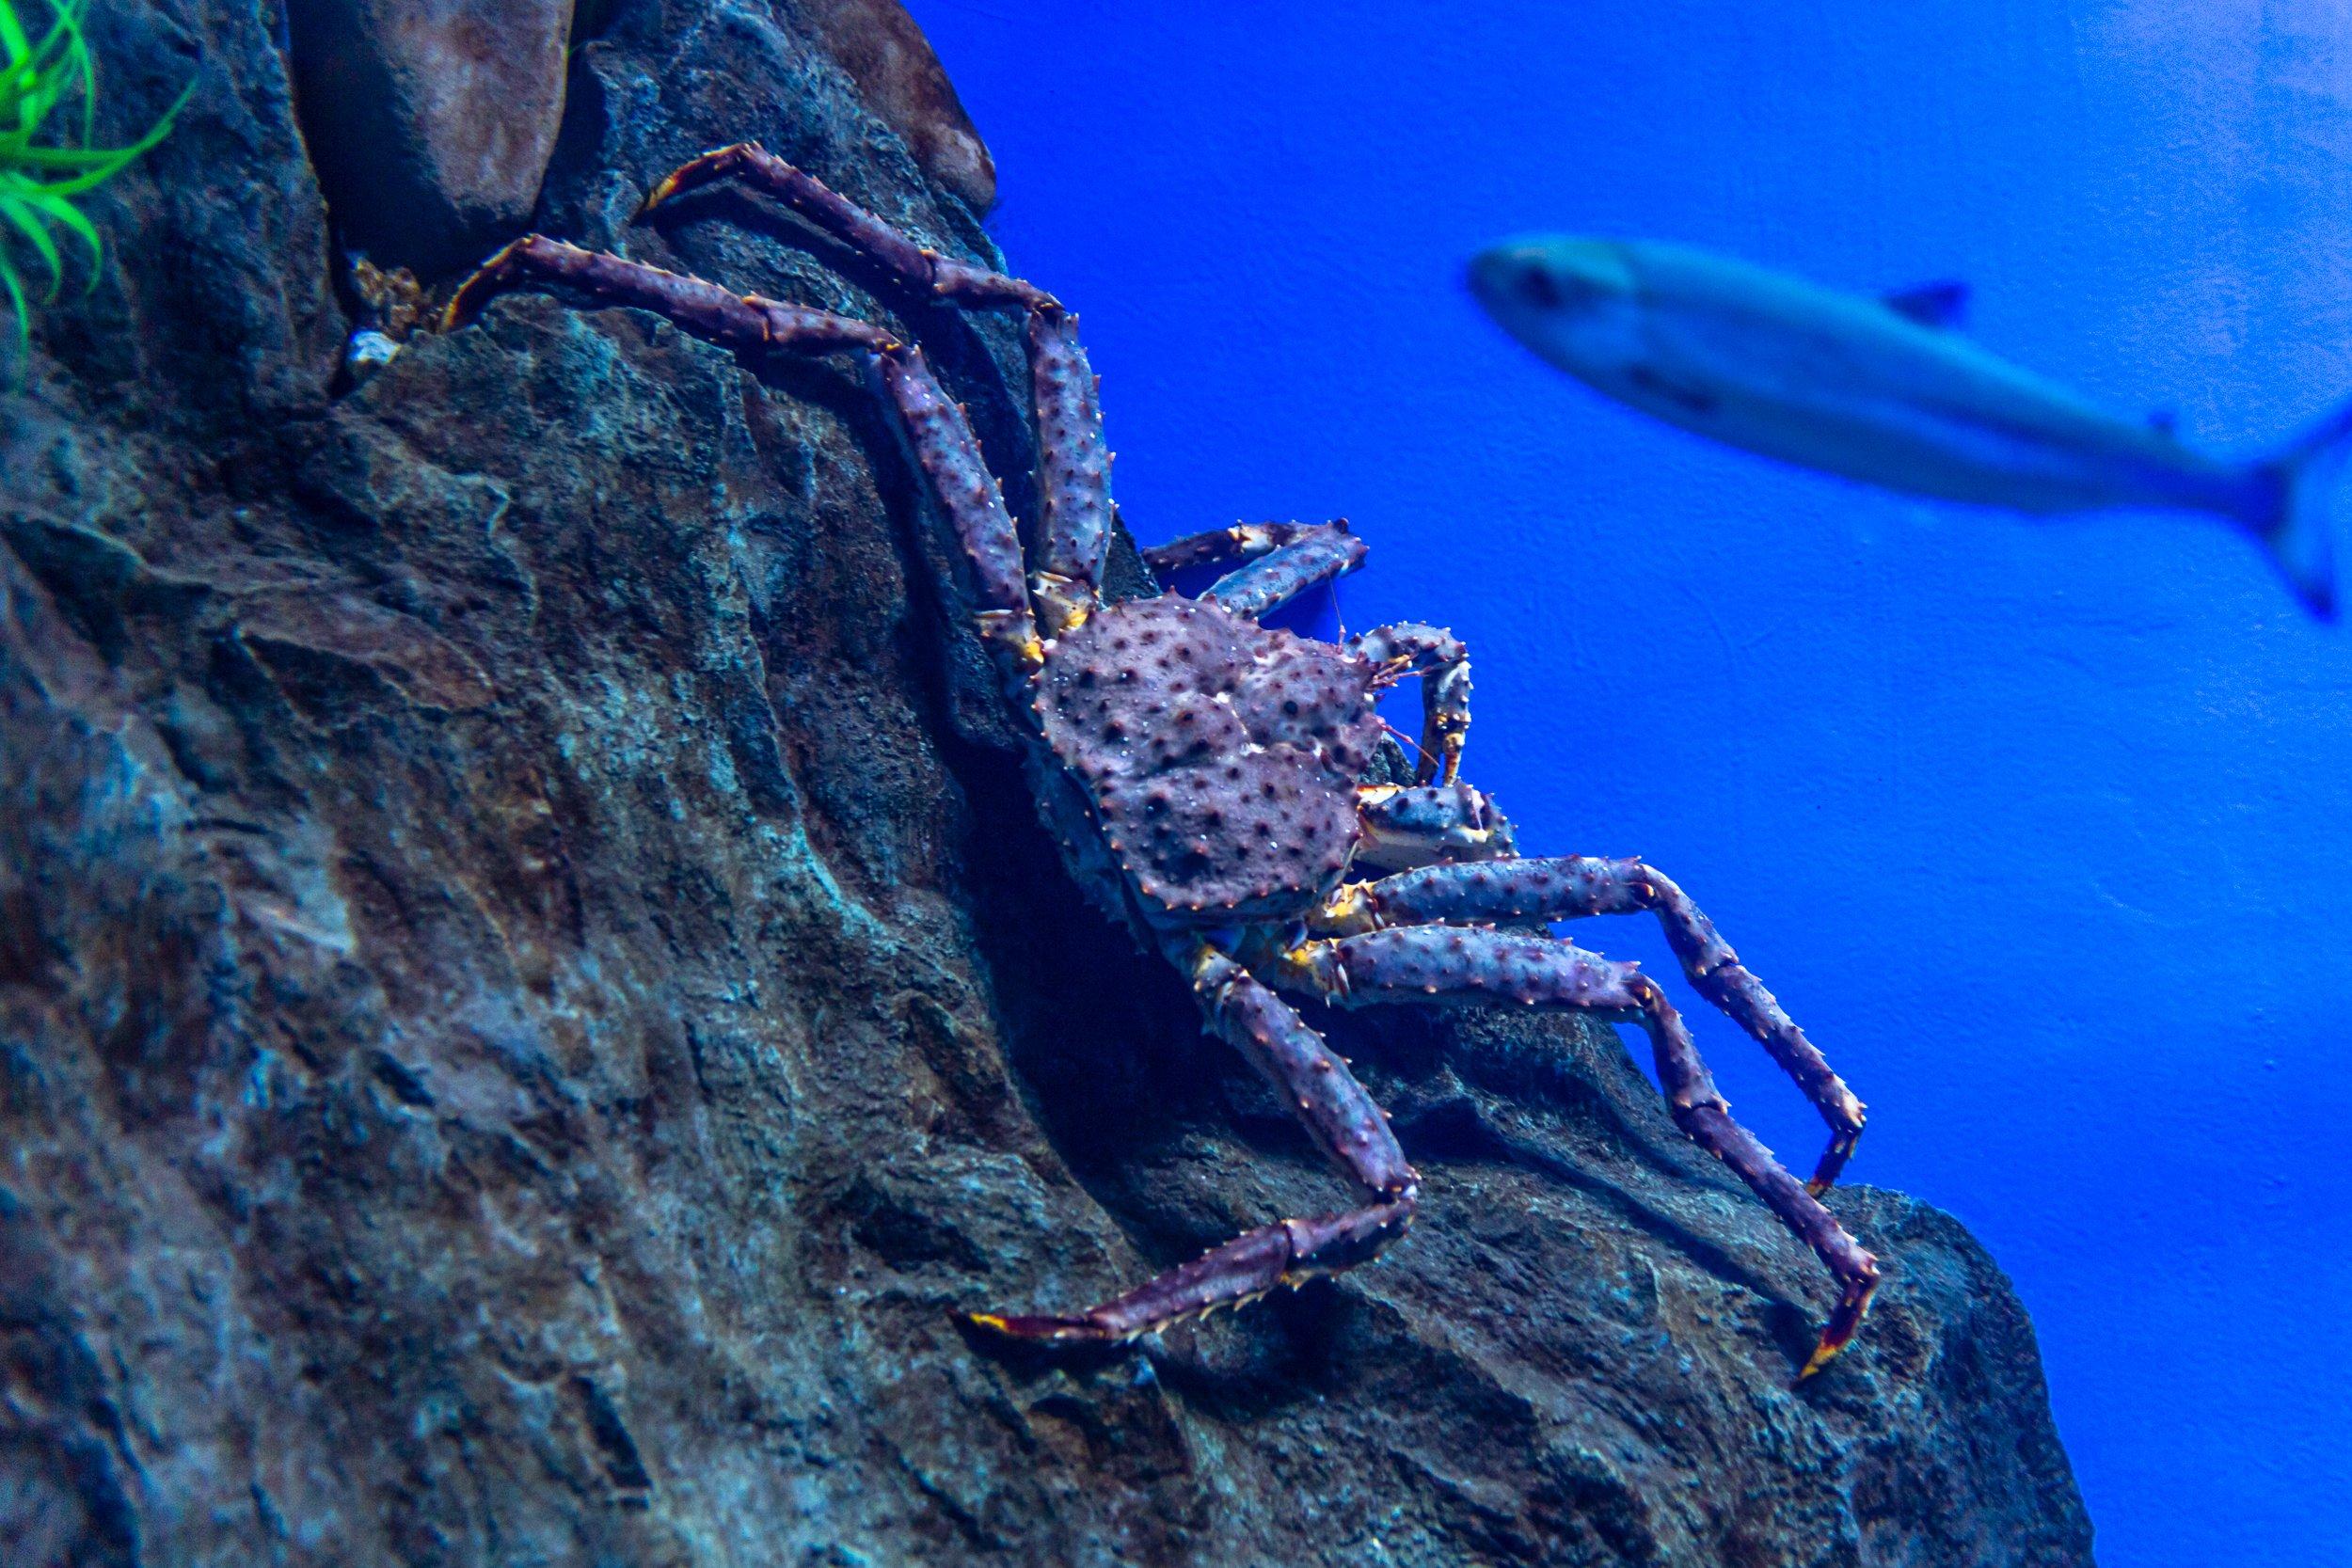 king crab in the ocean